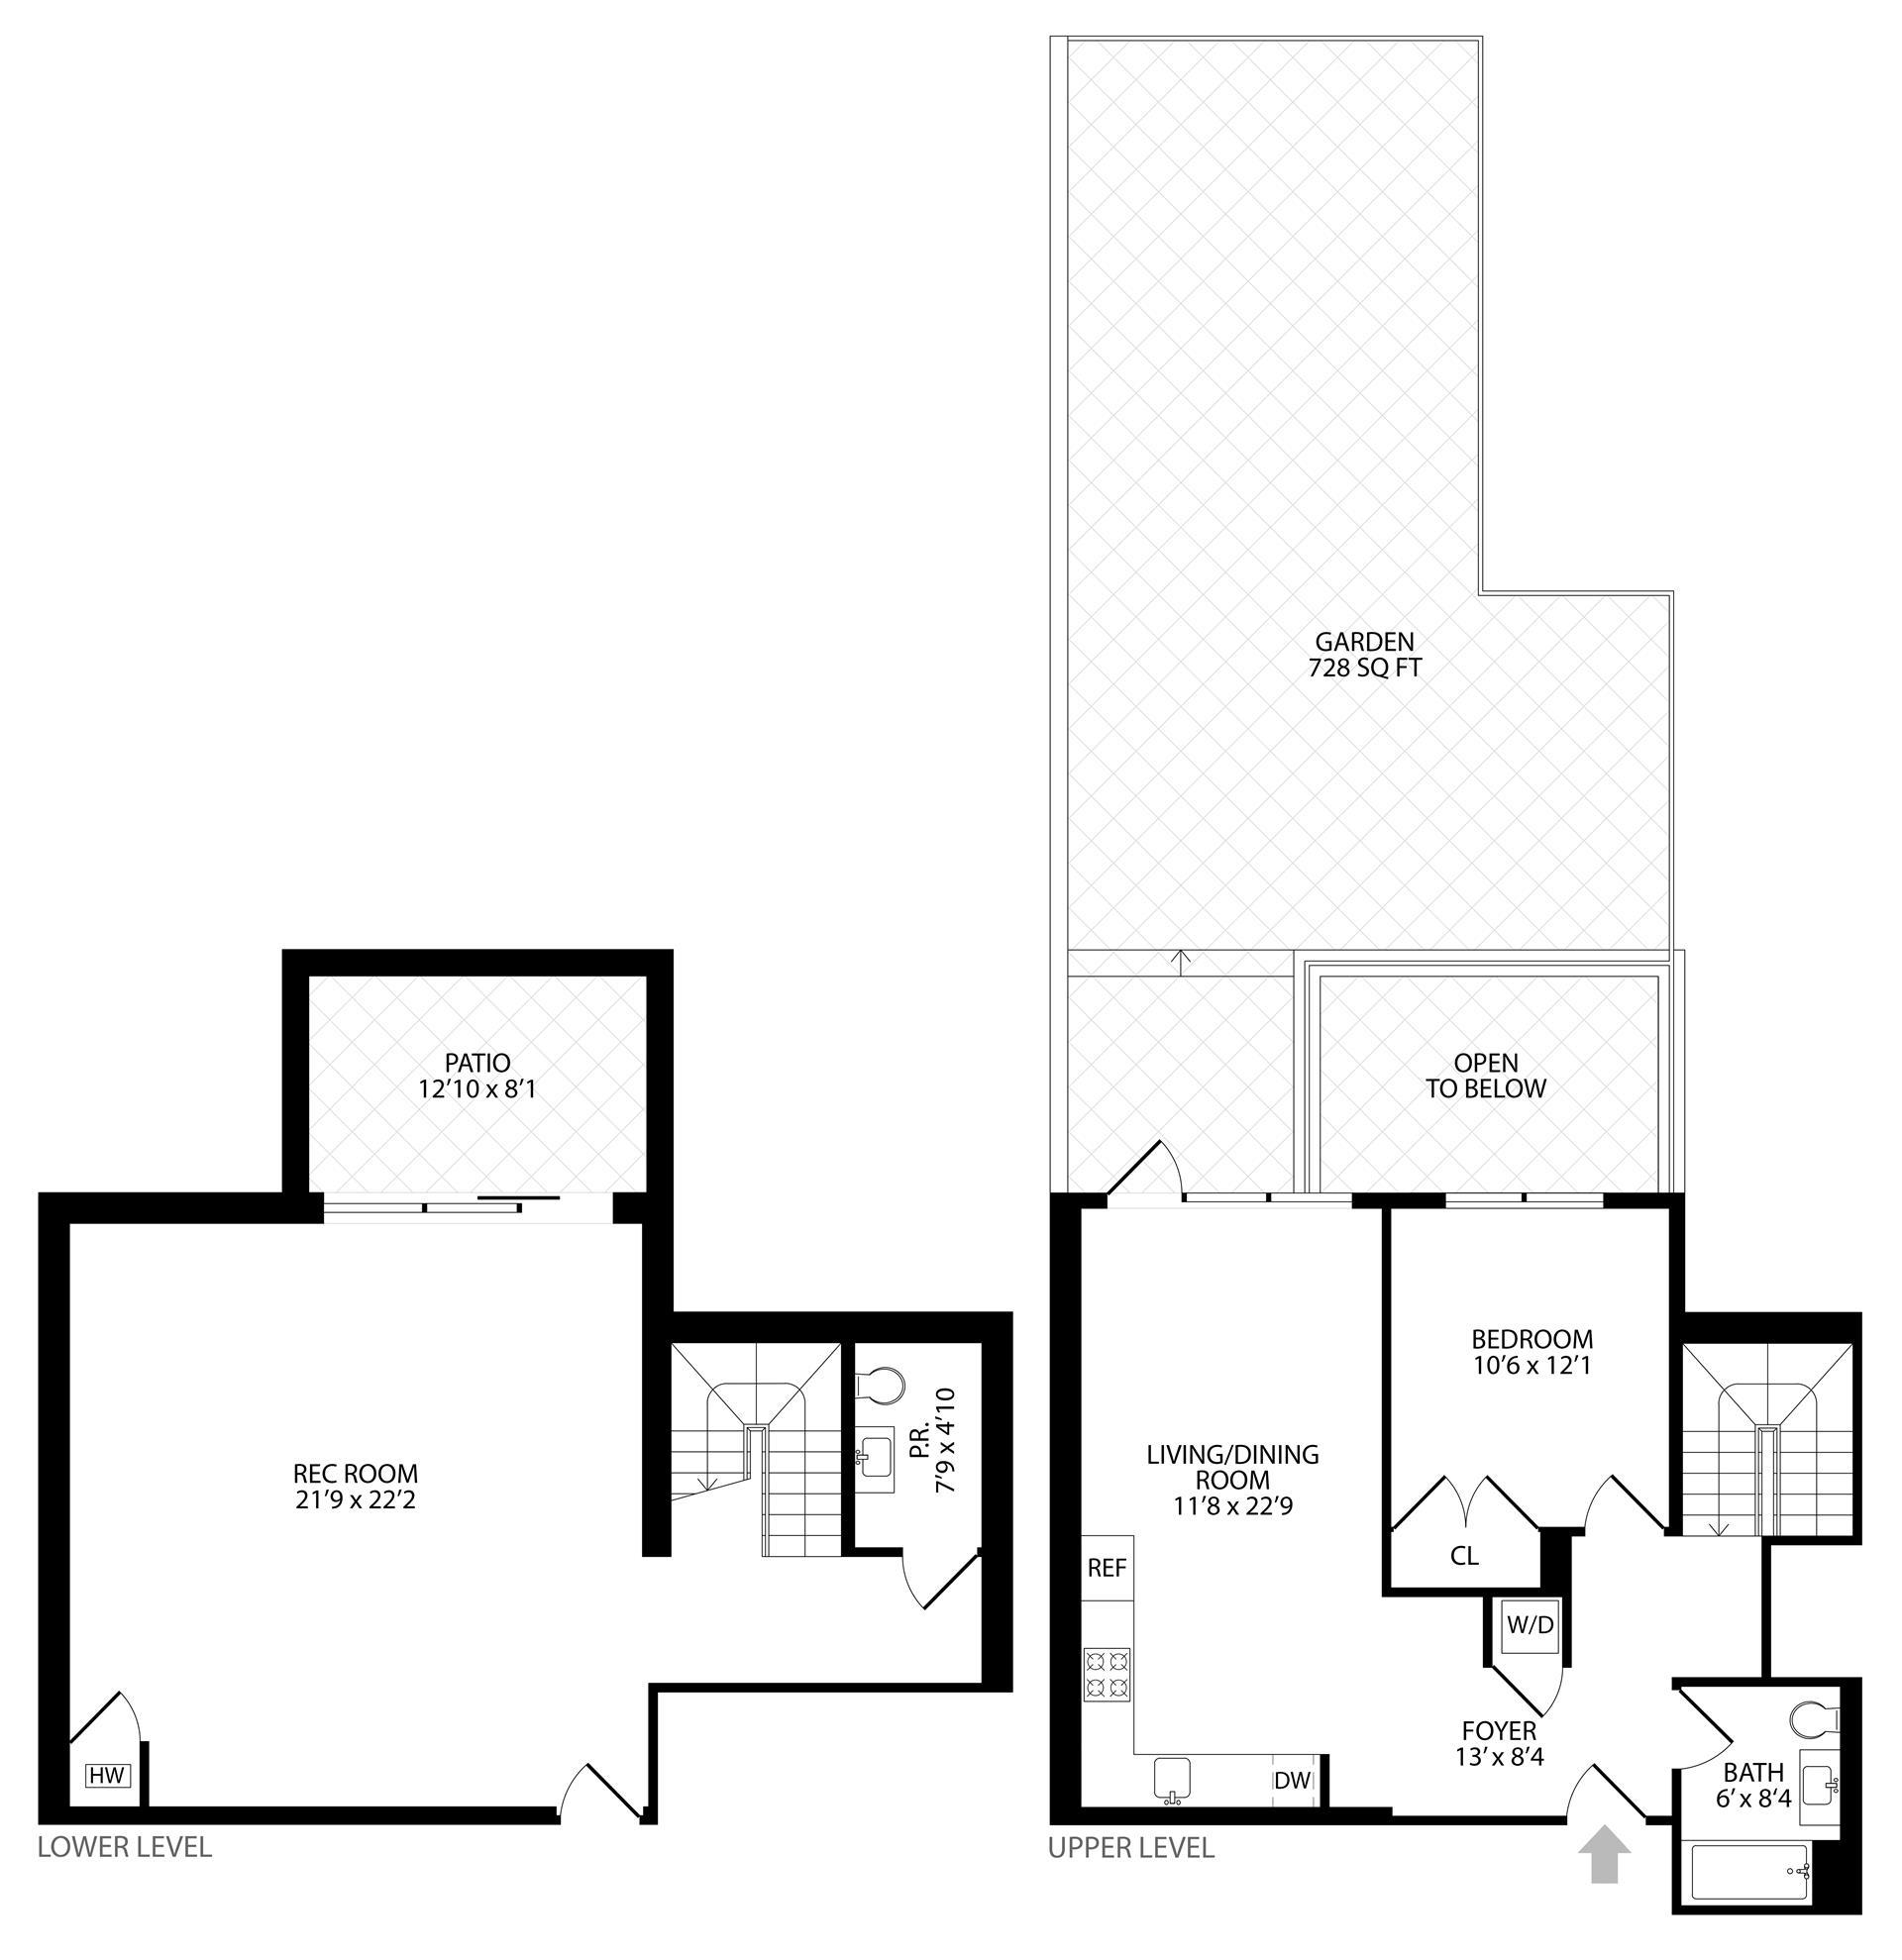 Floor plan of 203 Quincy St, 1B - Bedford - Stuyvesant, New York